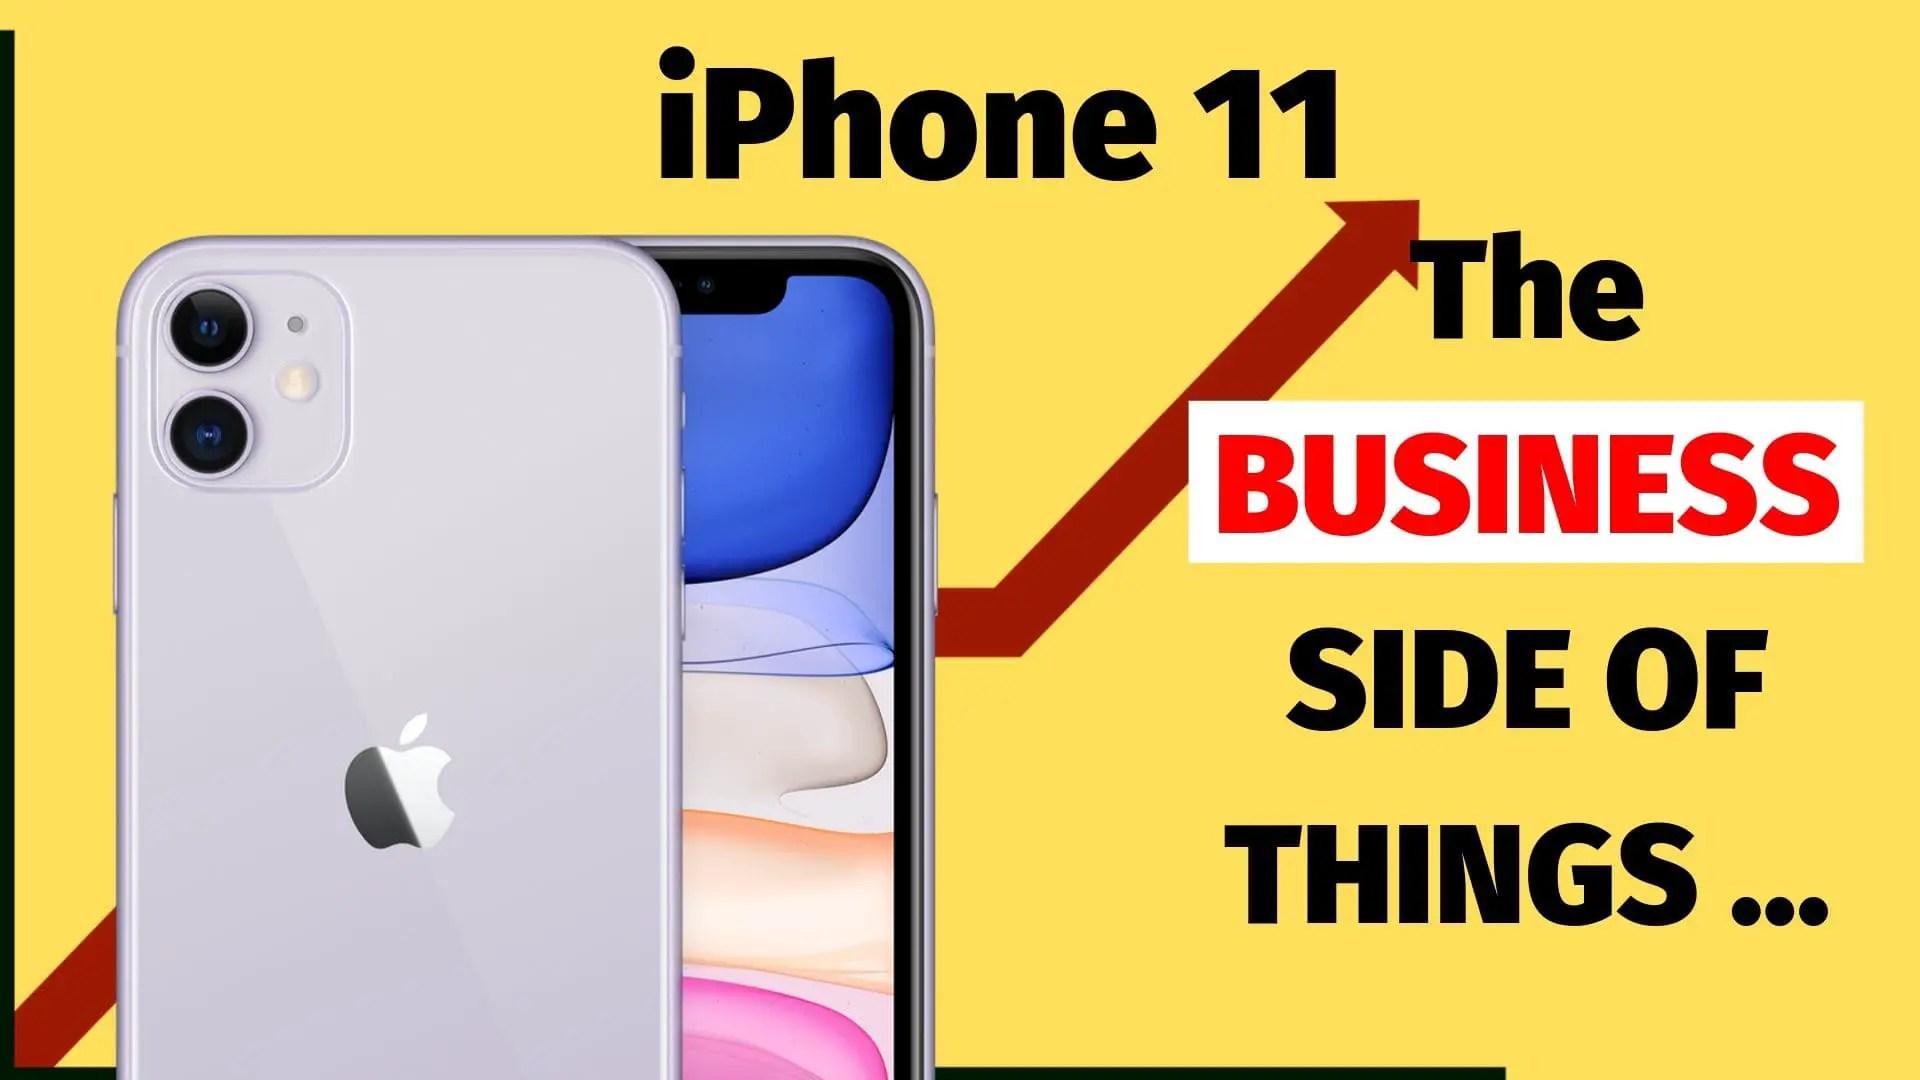 iphone 11 iphone sales